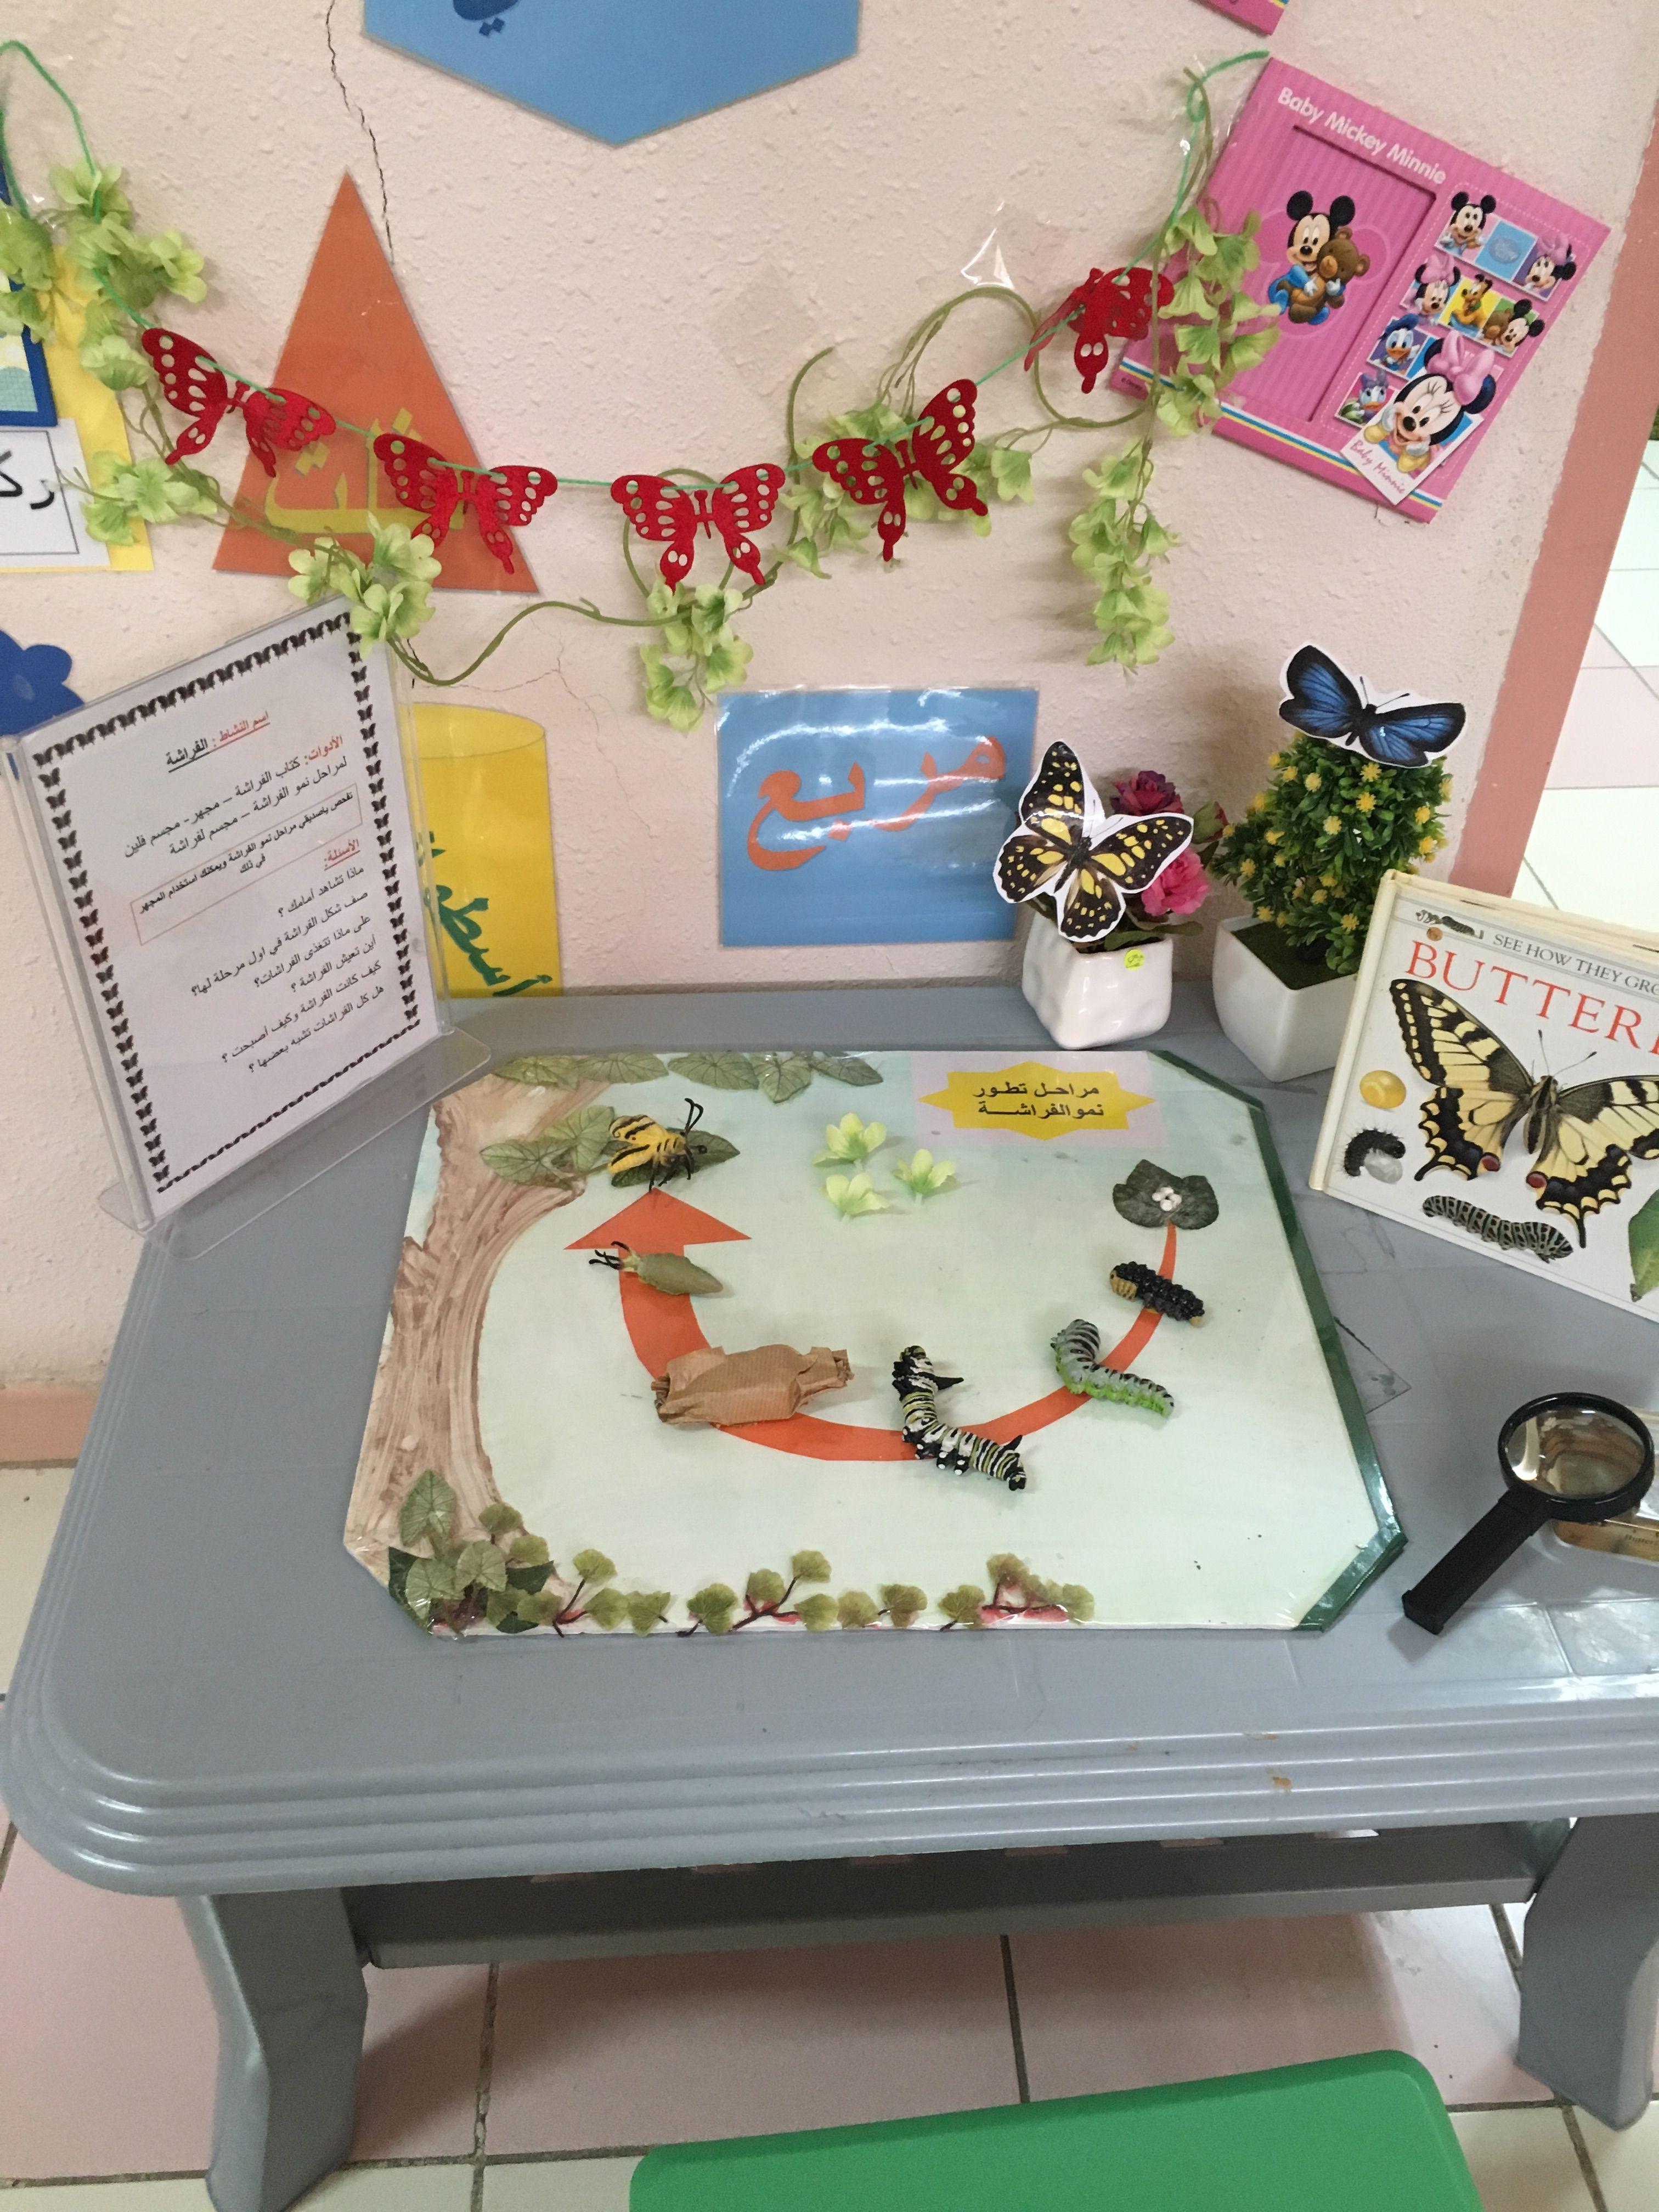 وحدة الحشرات دوره حياة الفراشه Dolls Clothes Diy Kids And Parenting Butterfly Life Cycle